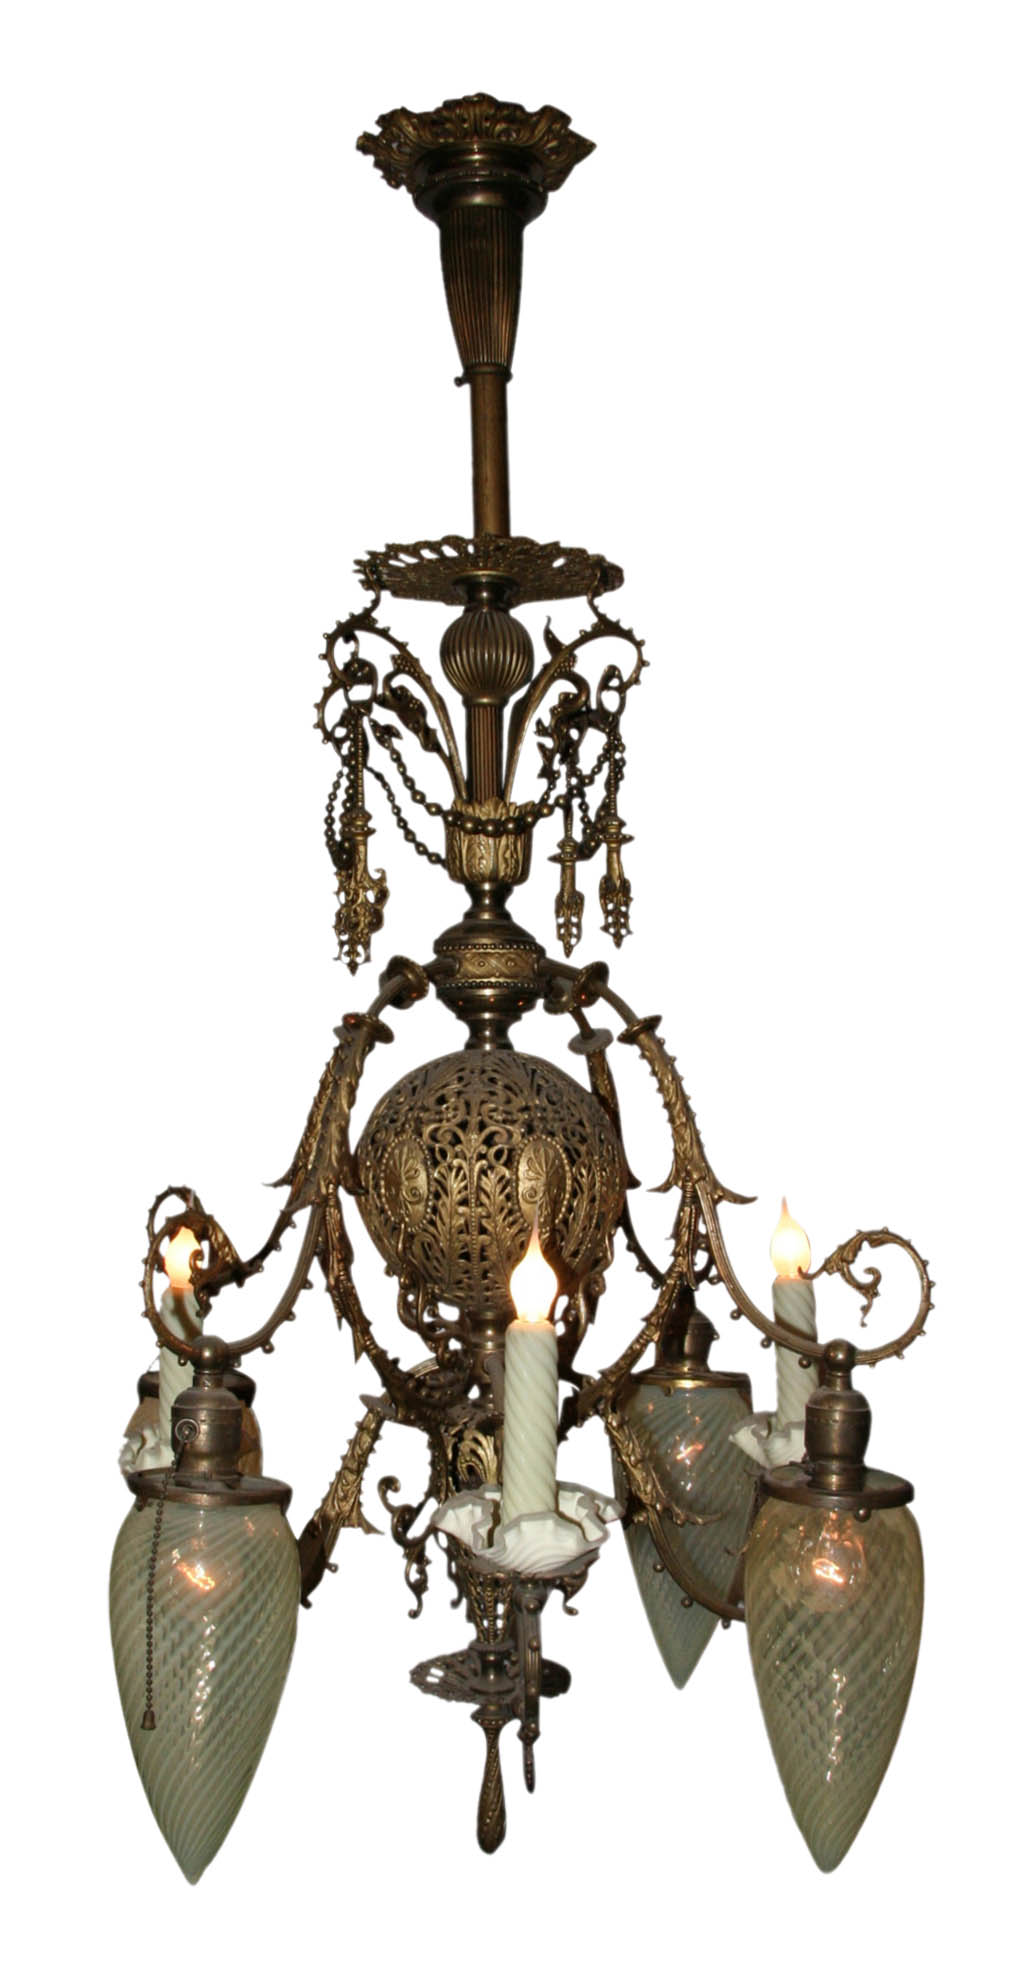 Antique victorian chandelier antique vintage lighting at antique victorian chandelier antique vintage lighting at victorian revival arubaitofo Choice Image